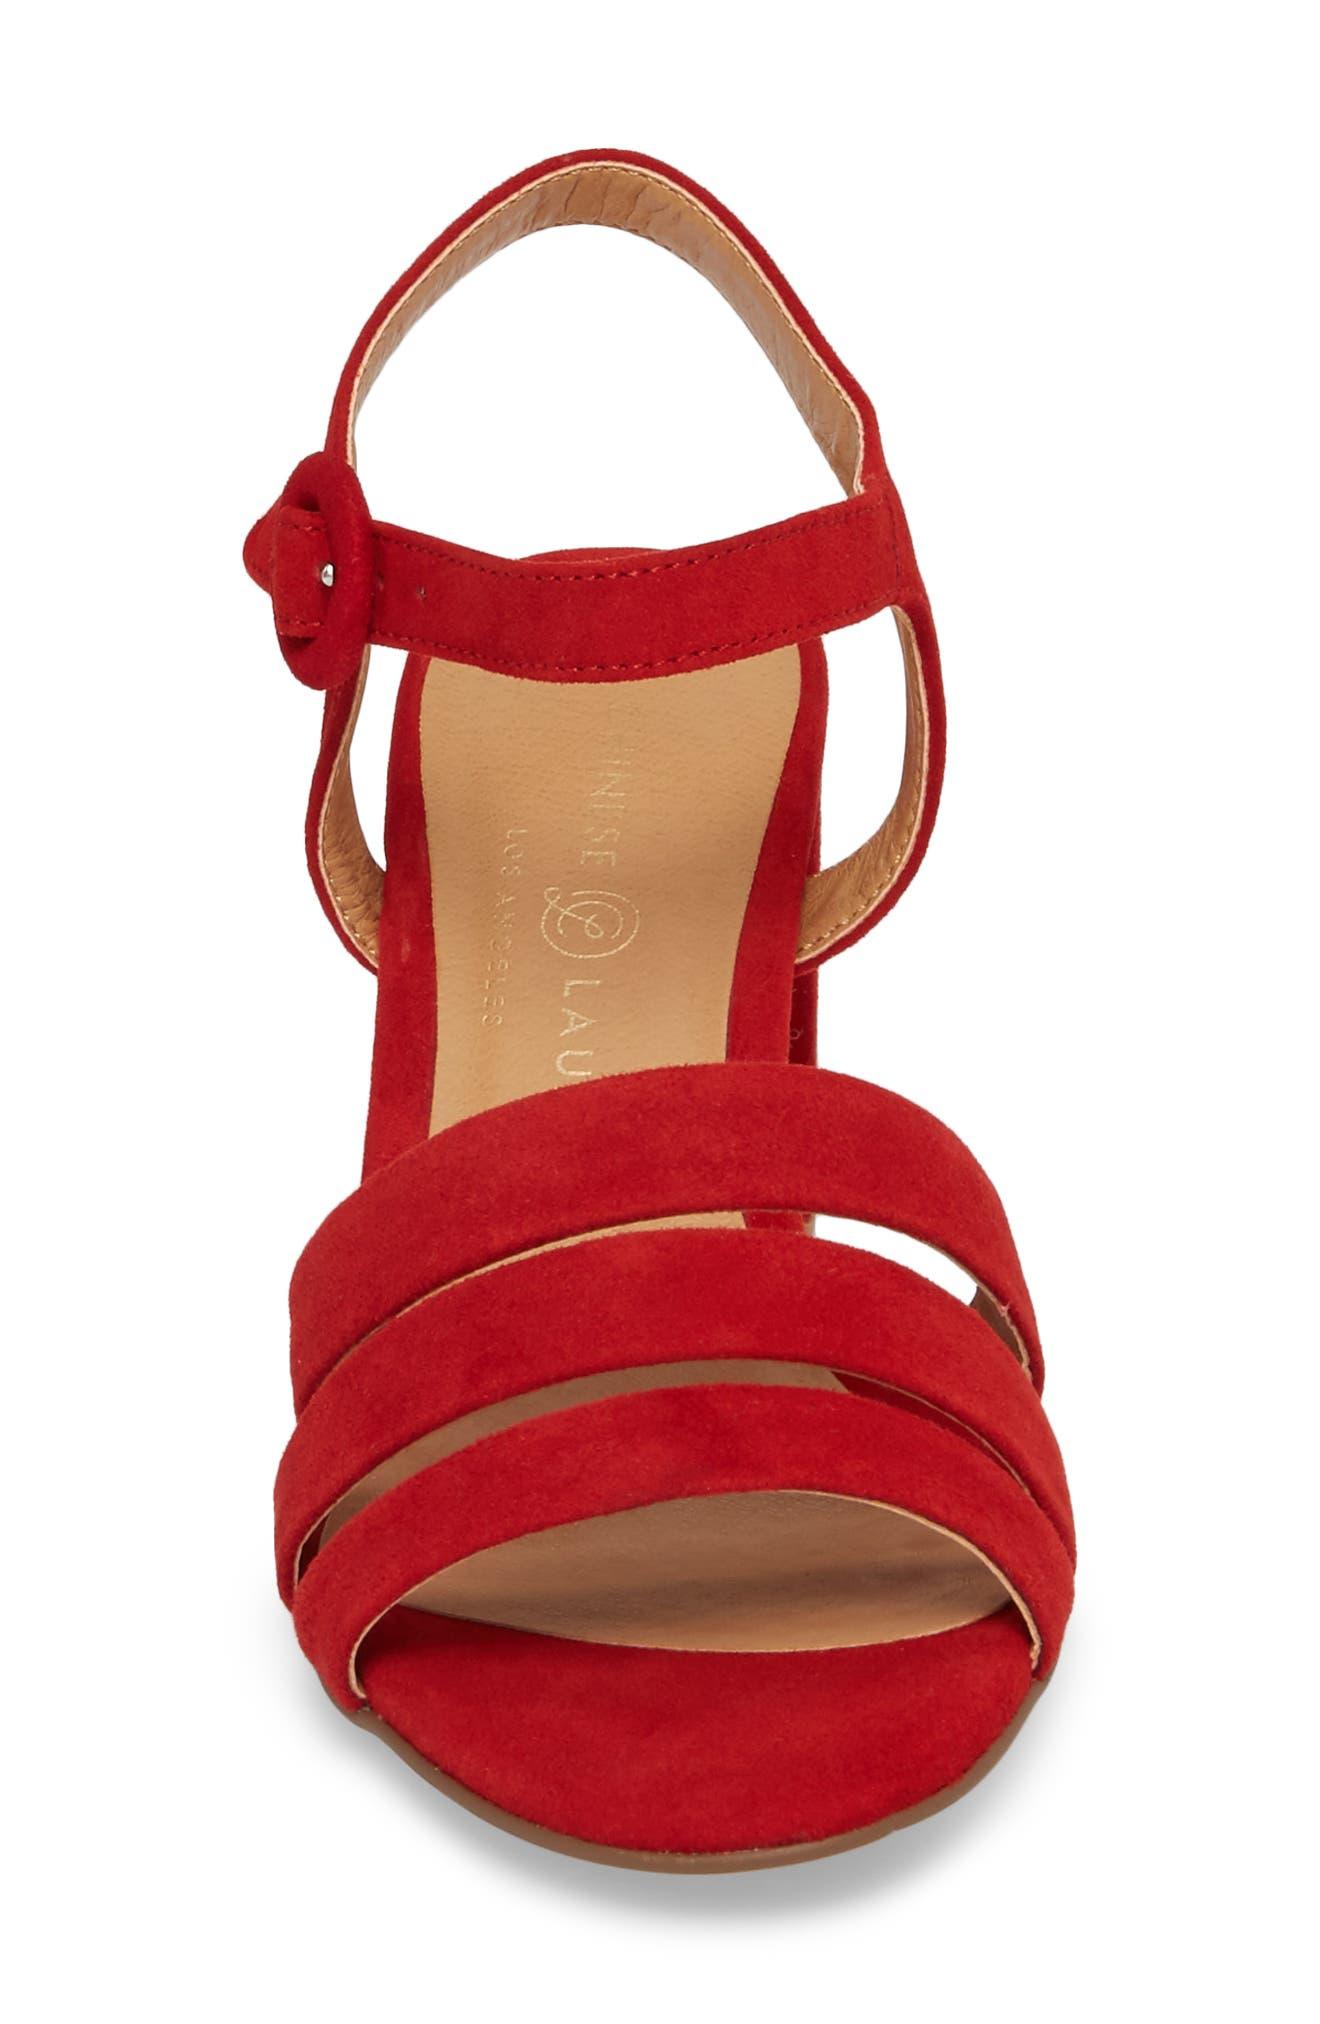 Ryden Strappy Sandal,                             Alternate thumbnail 4, color,                             Red